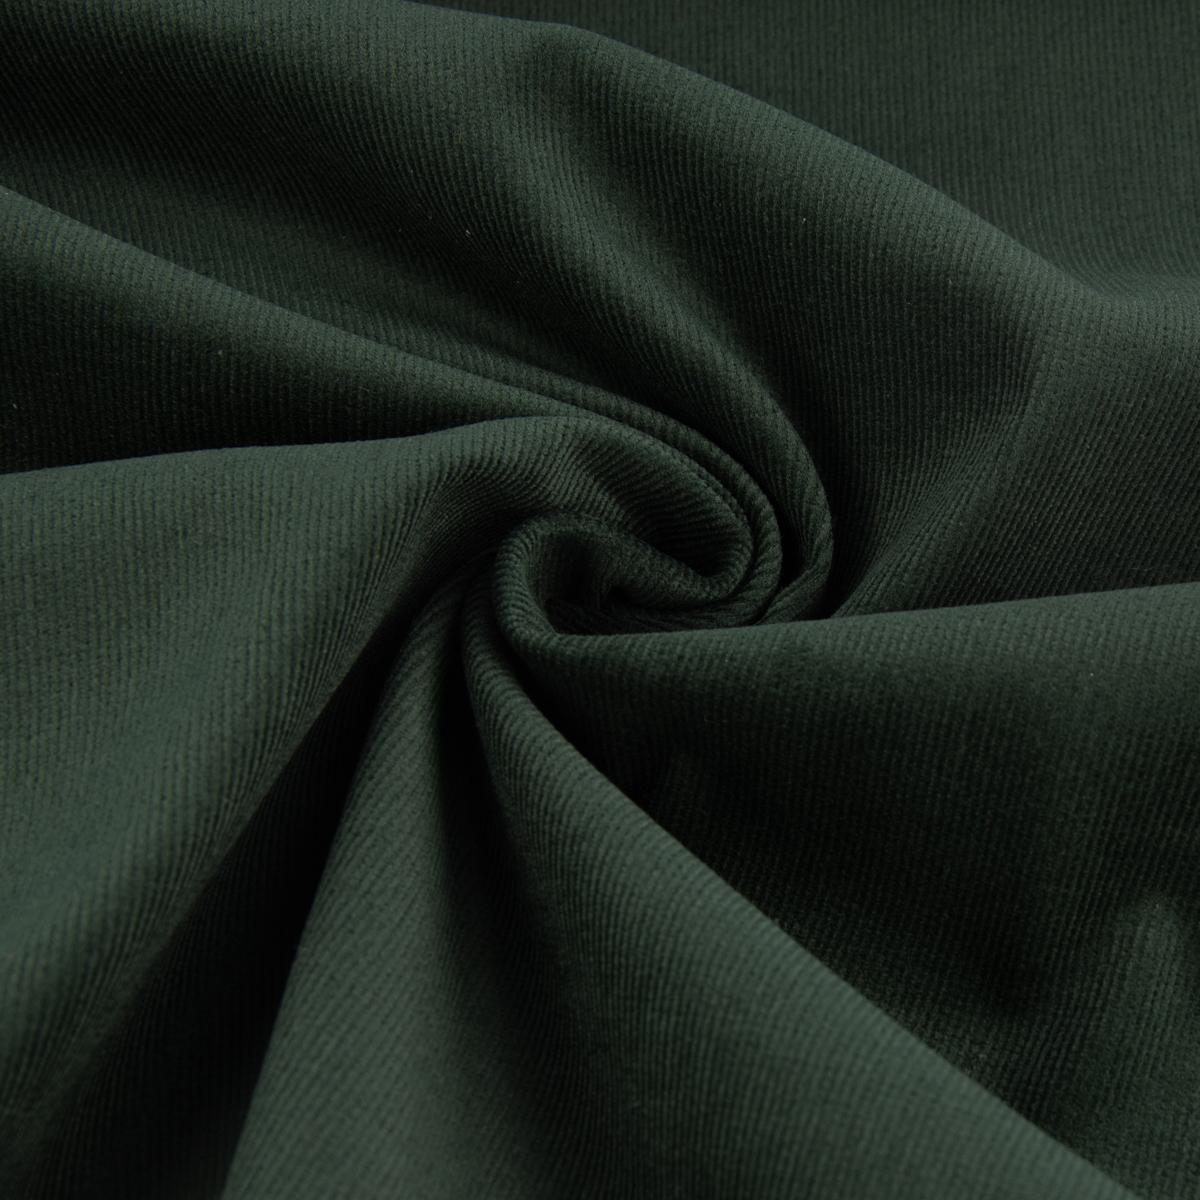 Stretch Cord einfarbig dunkelgrün 1,40m Breite